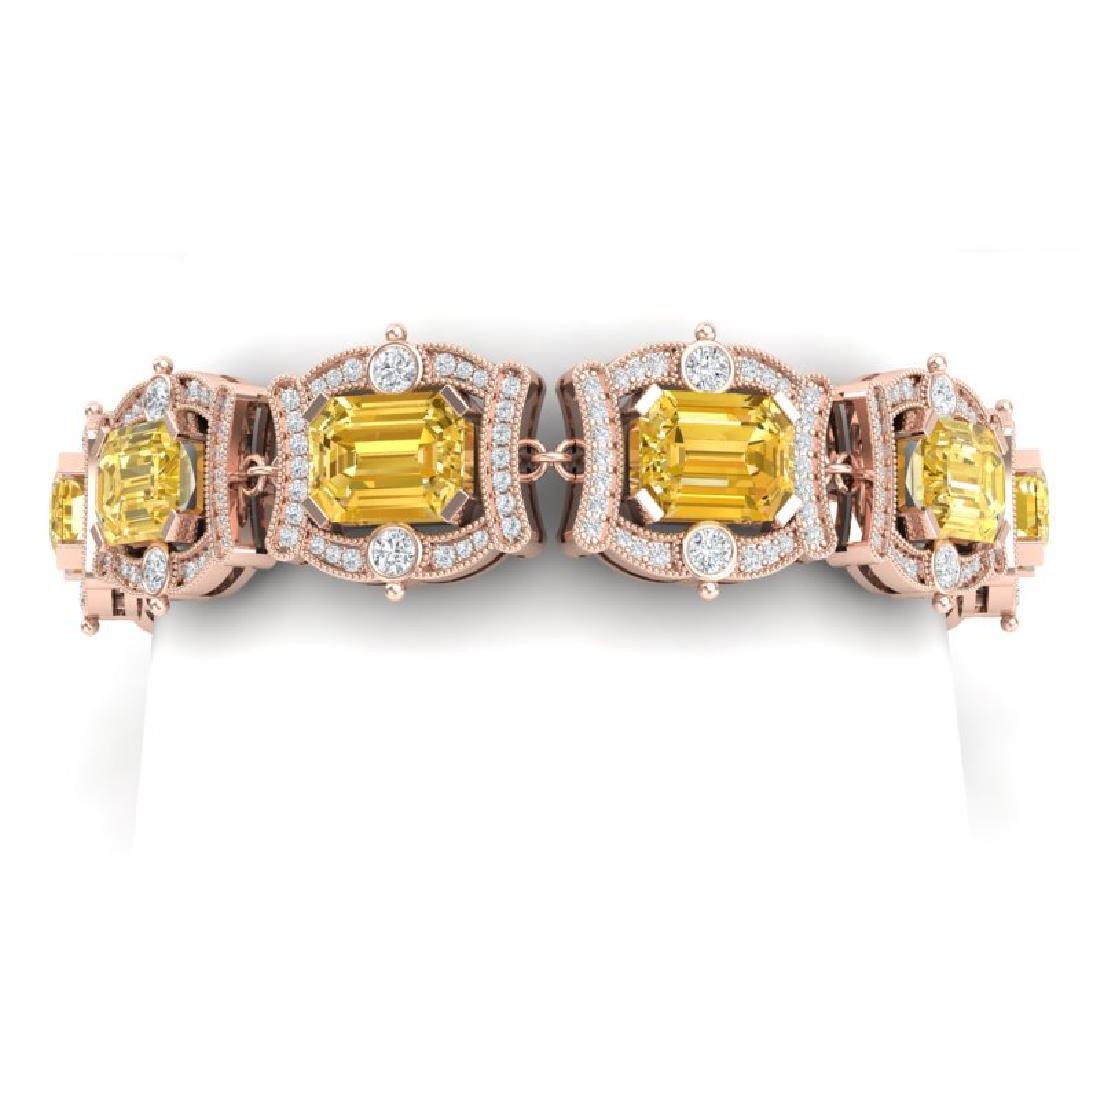 37.15 CTW Royalty Canary Citrine & VS Diamond Bracelet